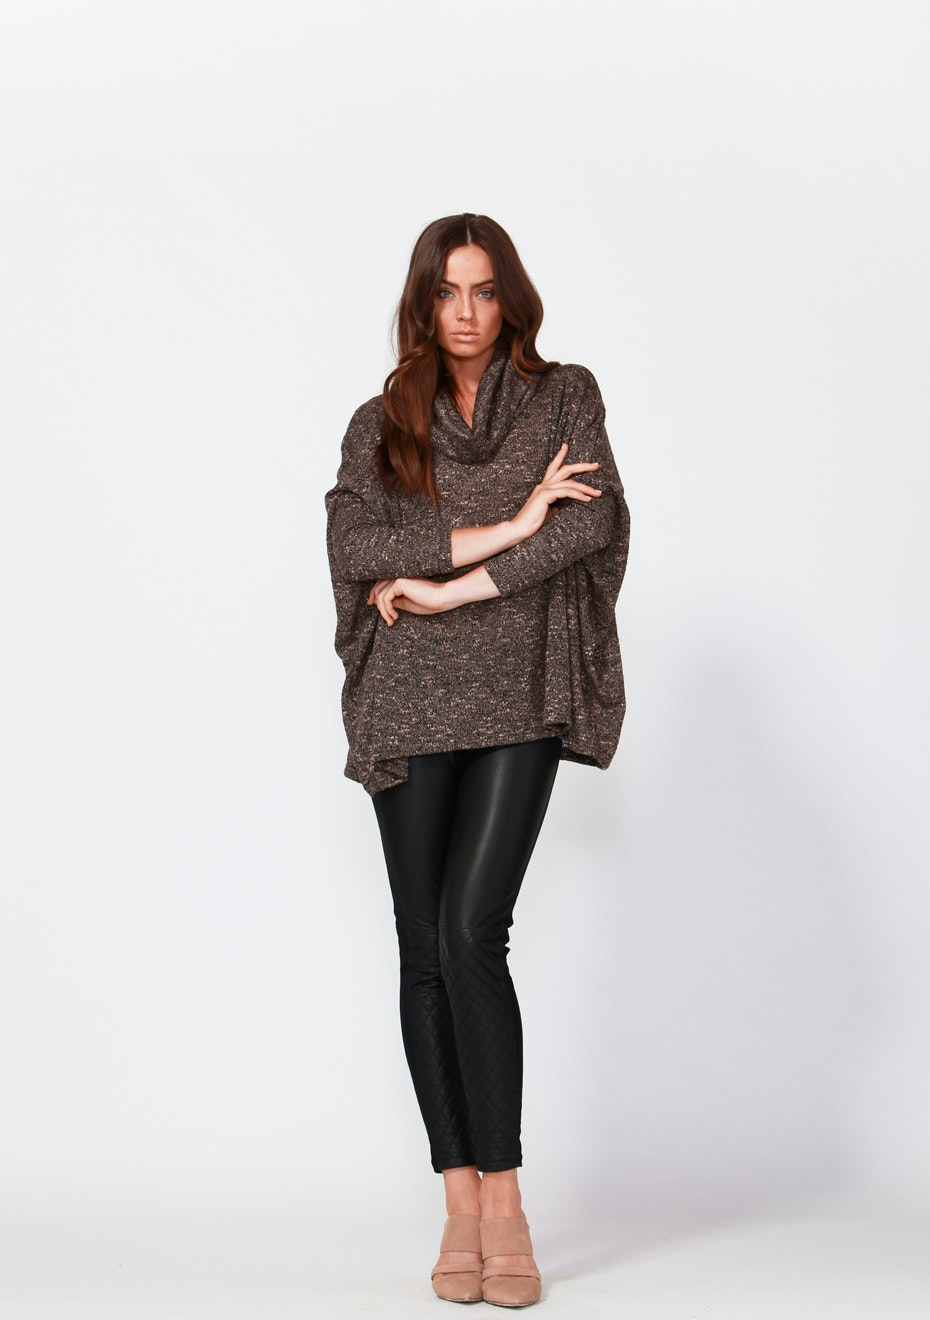 Fate - Adrina Leather Pant  - Black